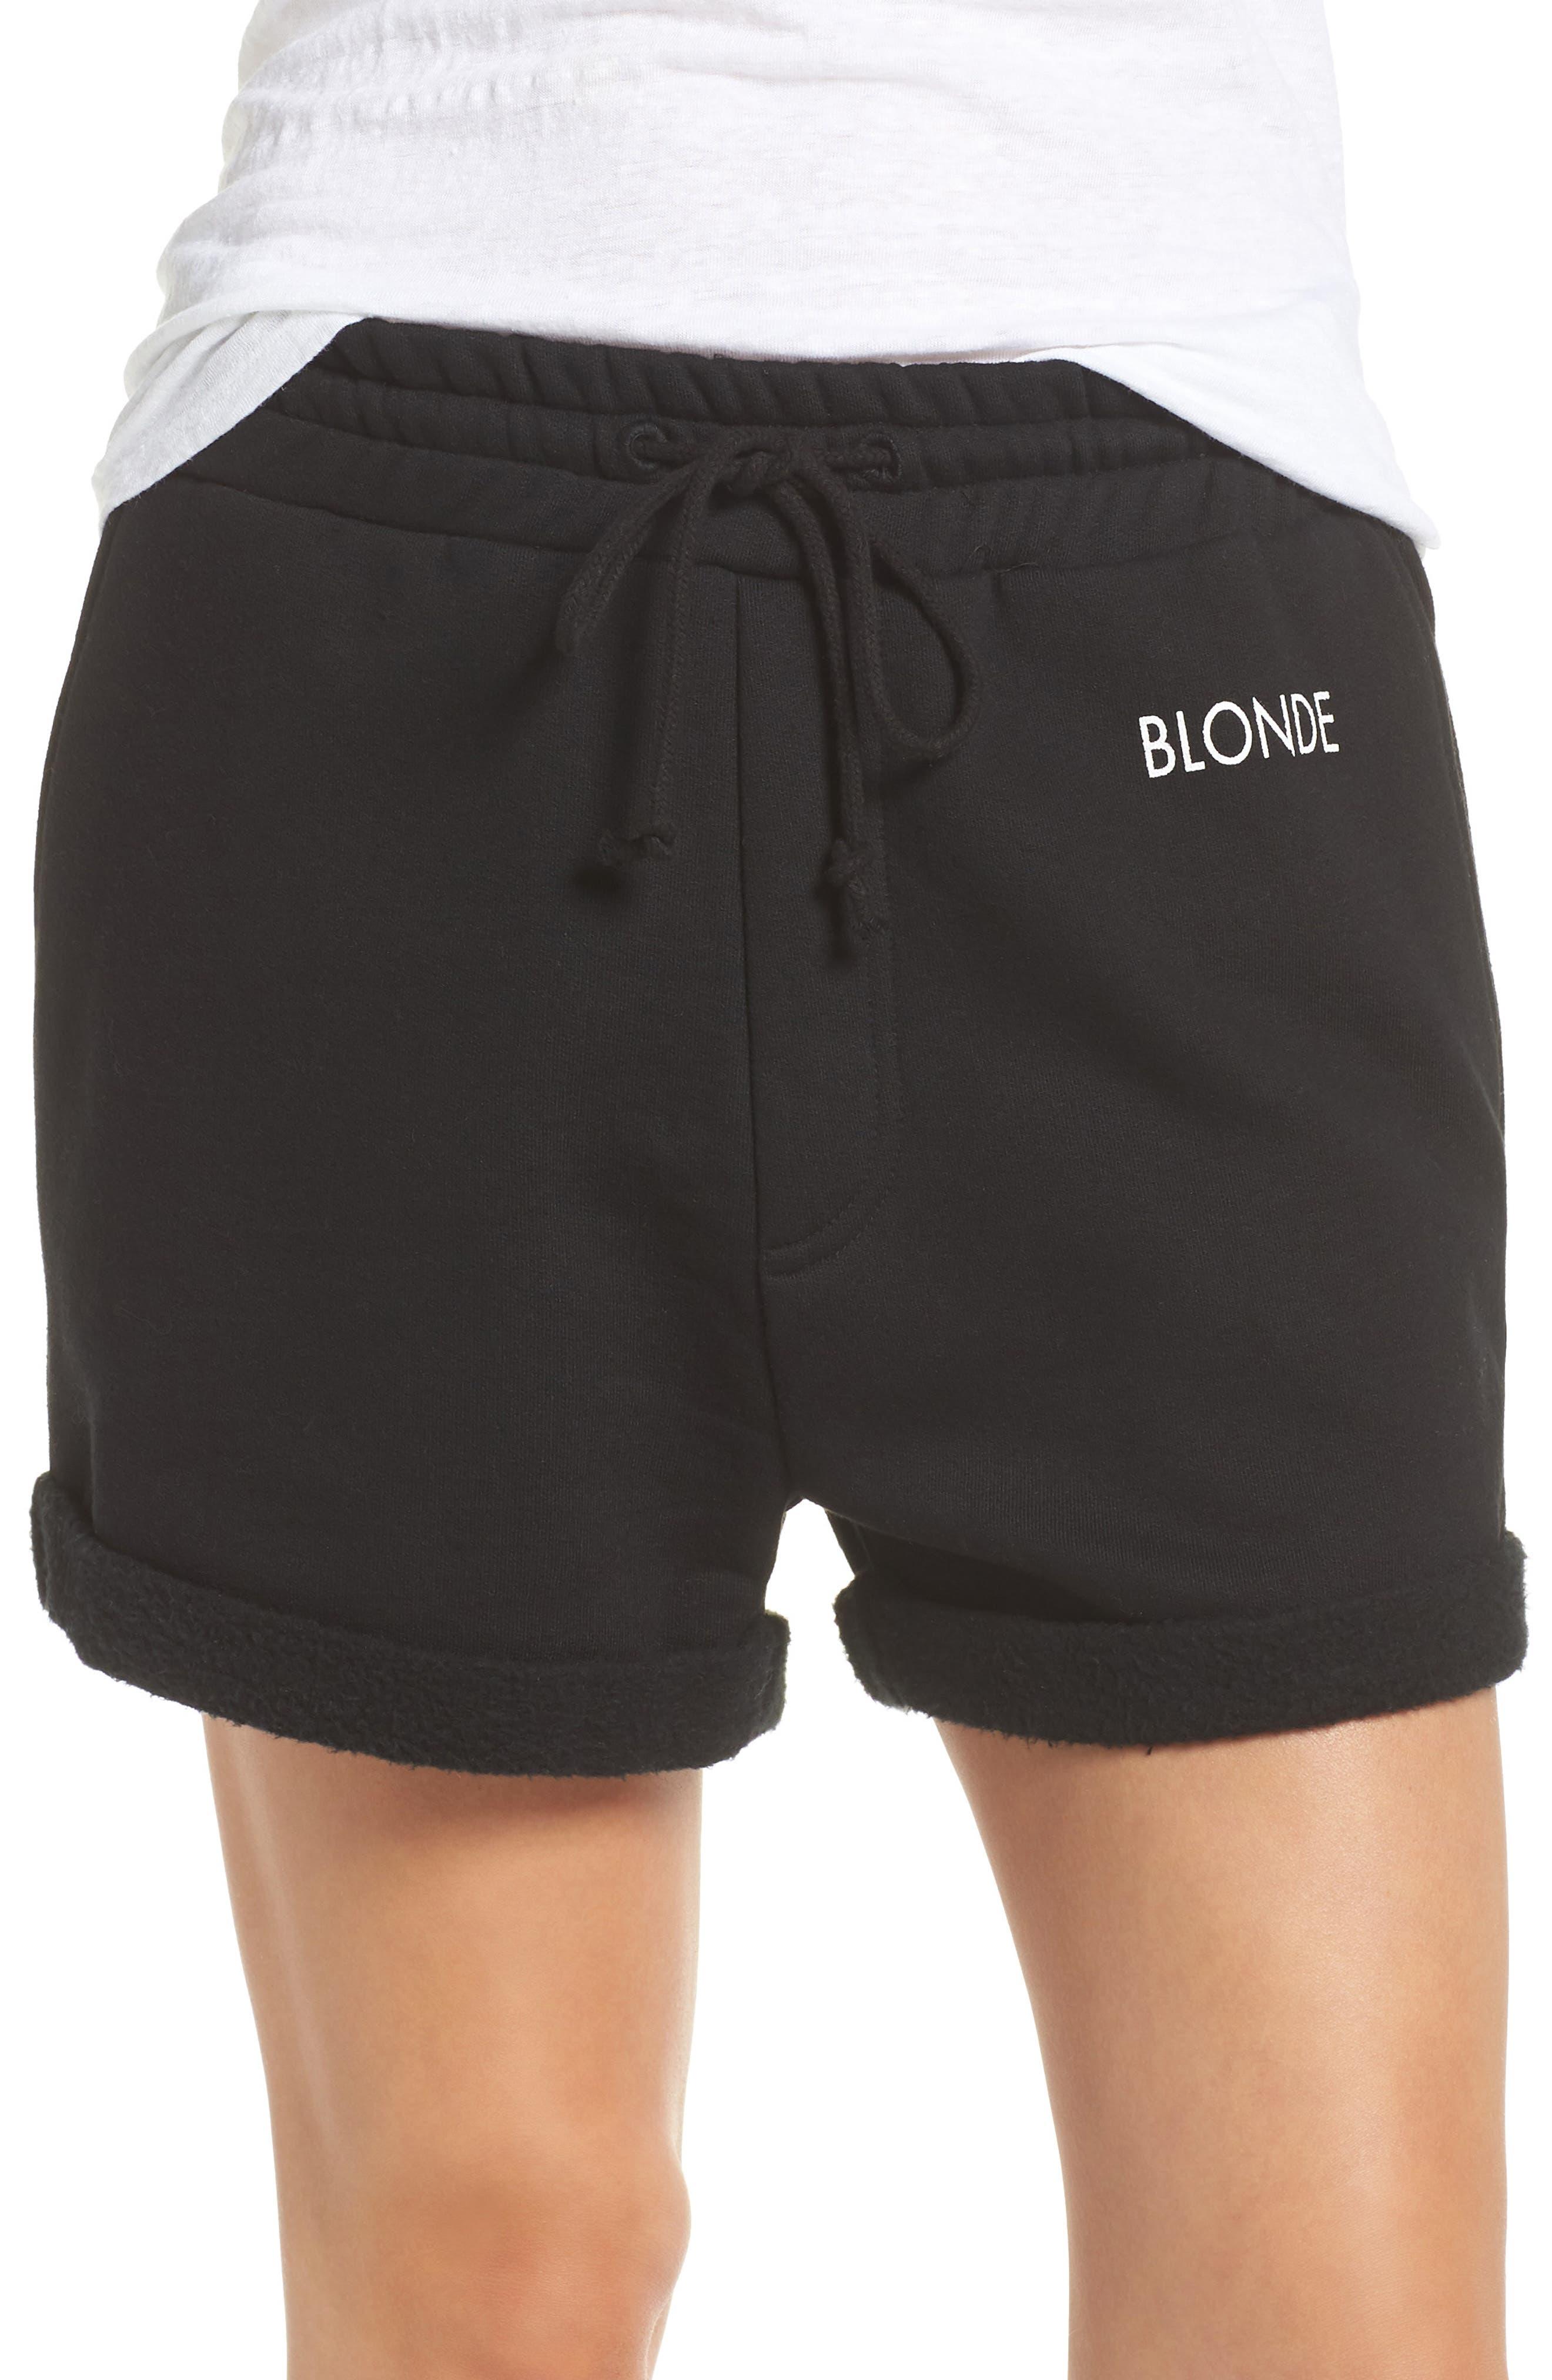 Blonde Lounge Shorts,                             Main thumbnail 1, color,                             Black